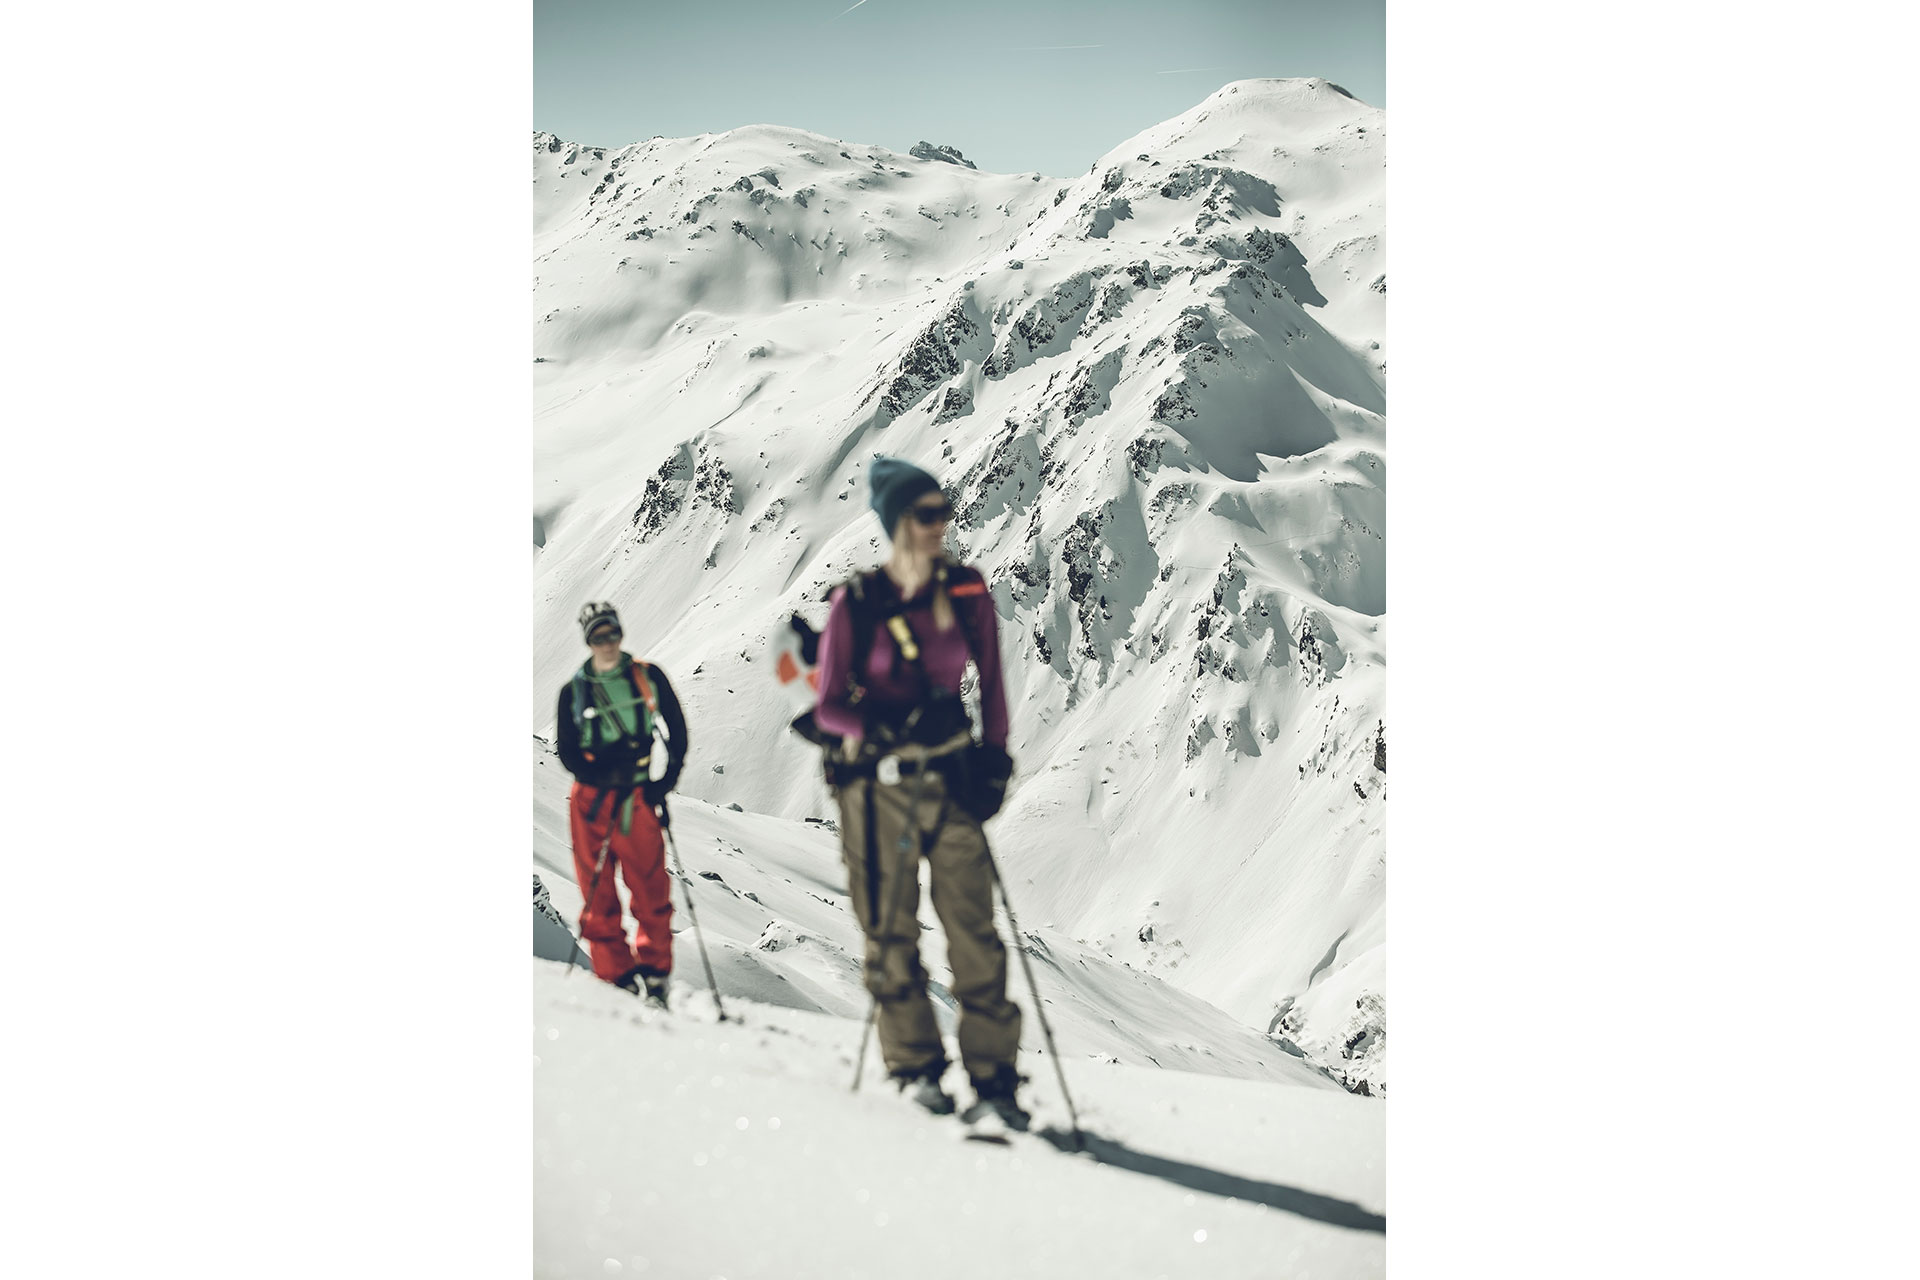 Winter Splitboard Tour Foto Produktion Sportfotograf Outdoor Tiefschnee London England